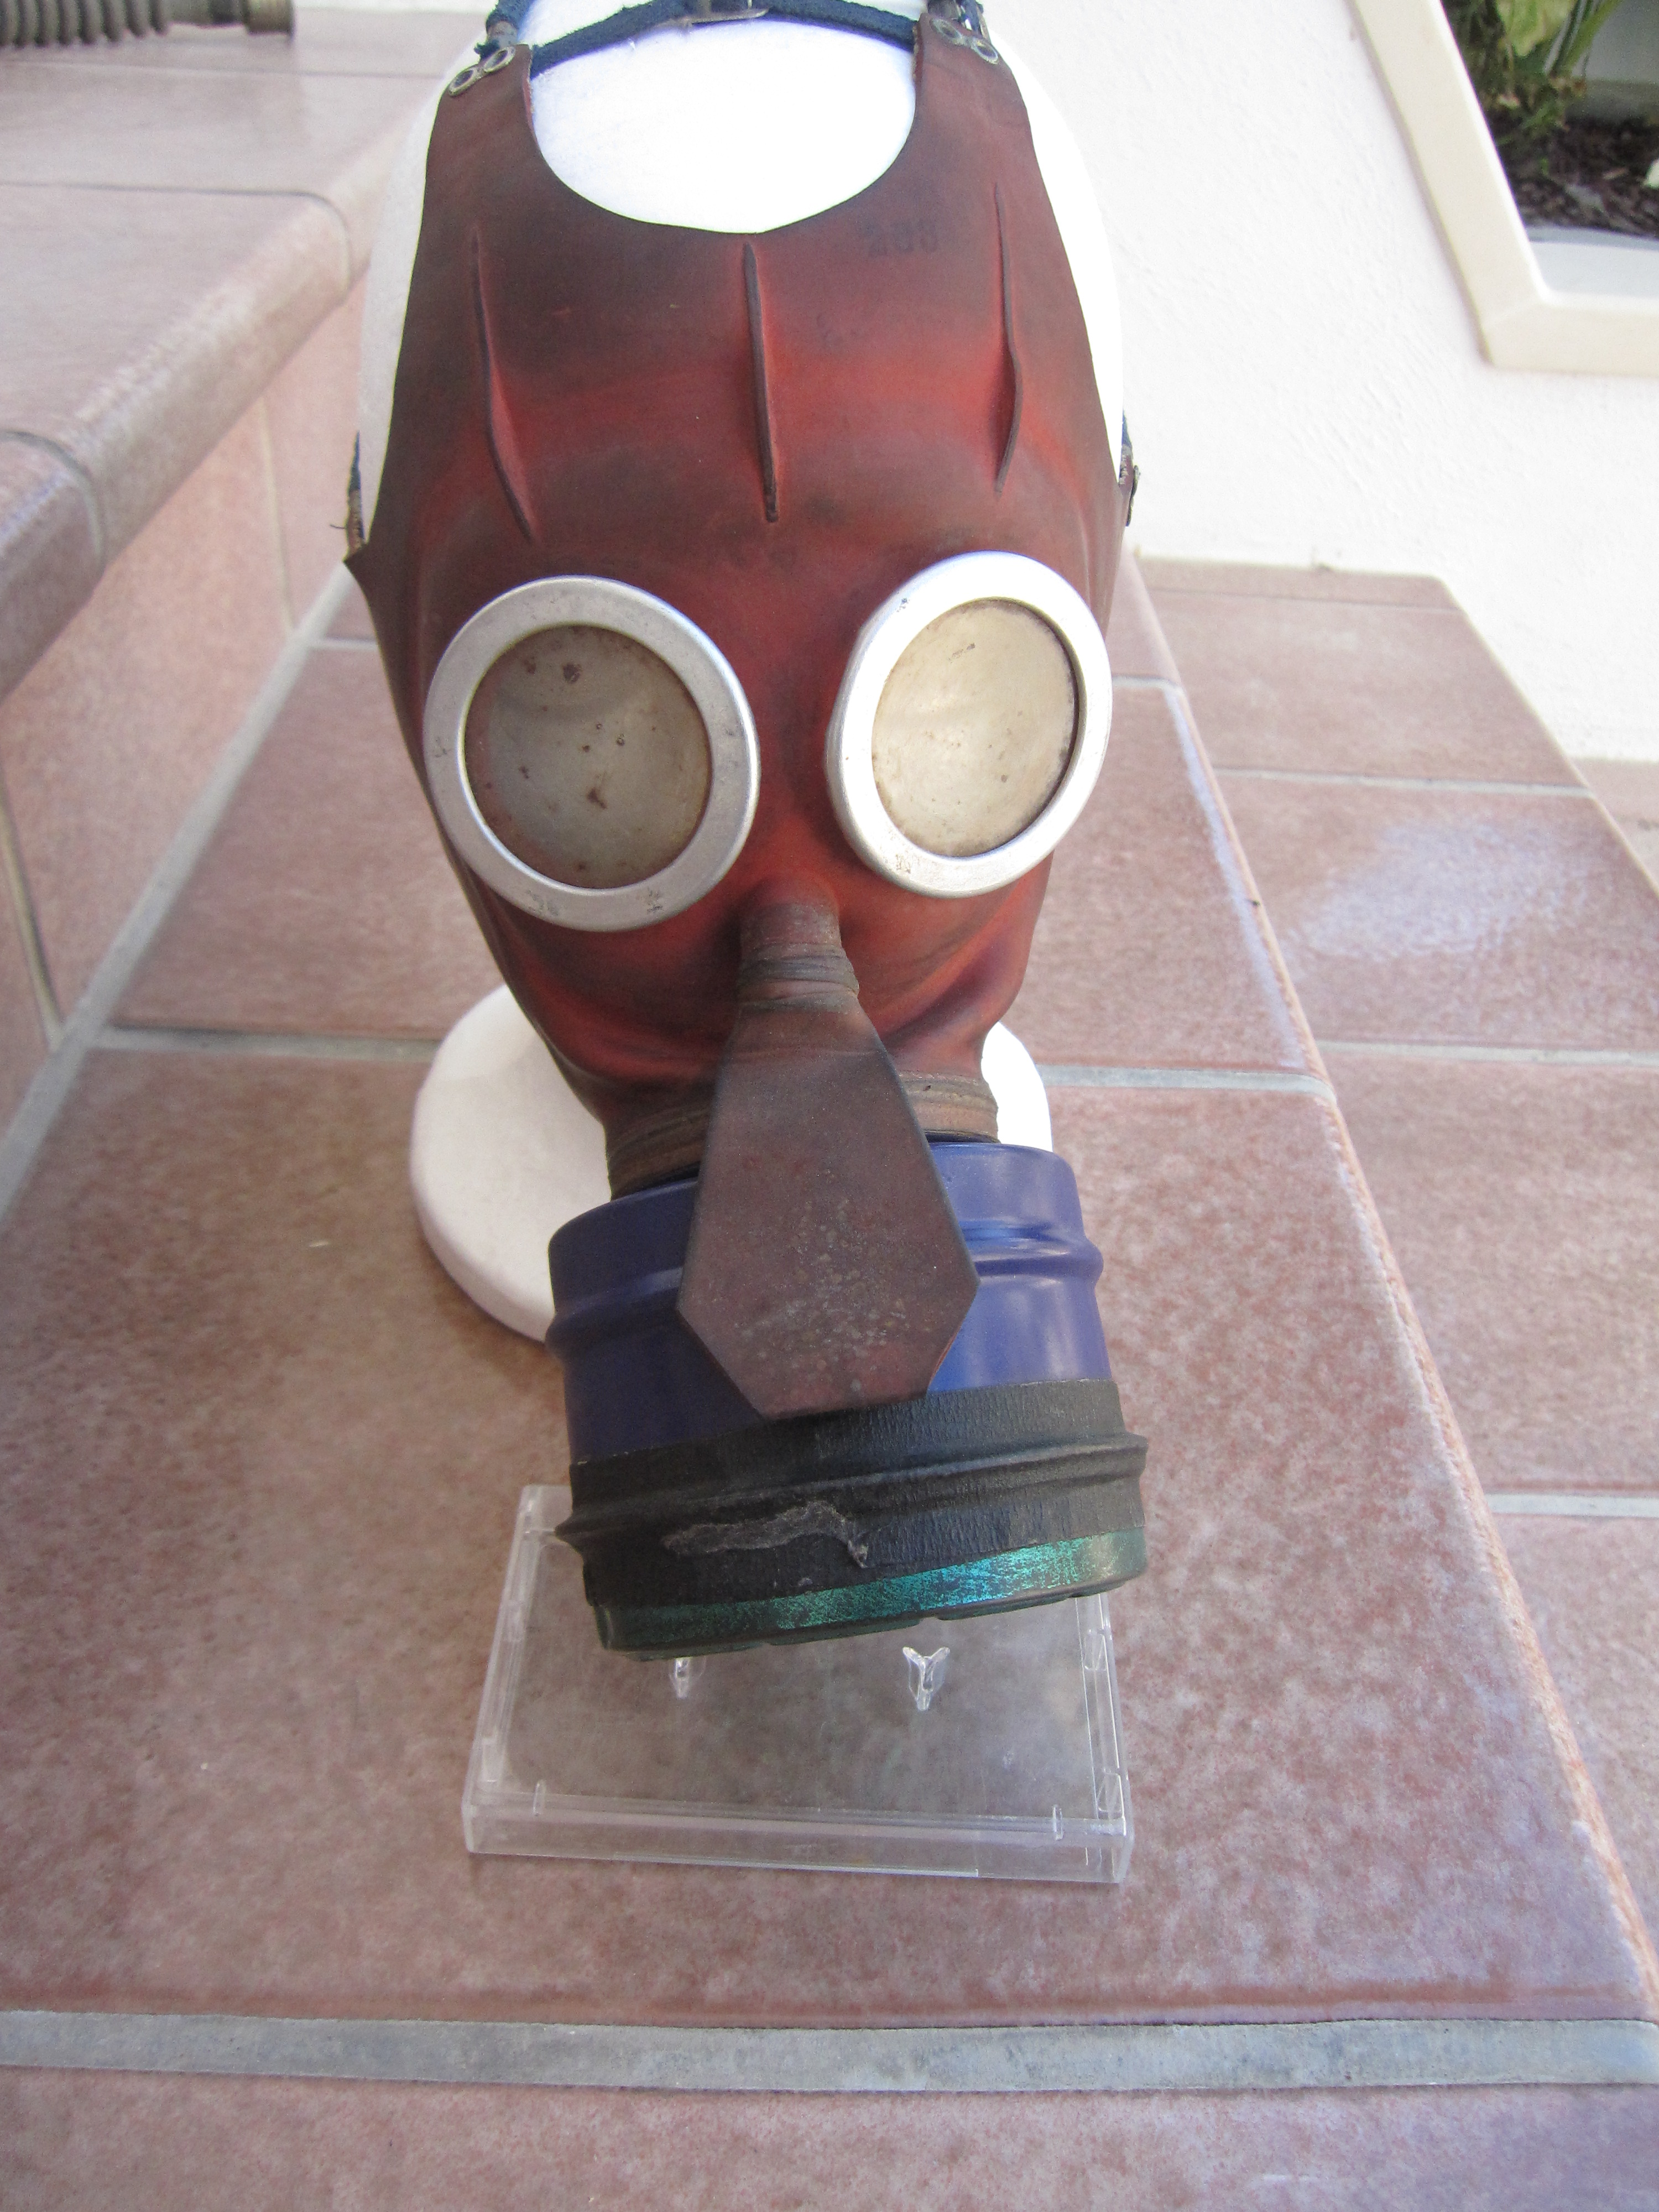 Avon C2 'Mickey Mouse' Small Child Respirator